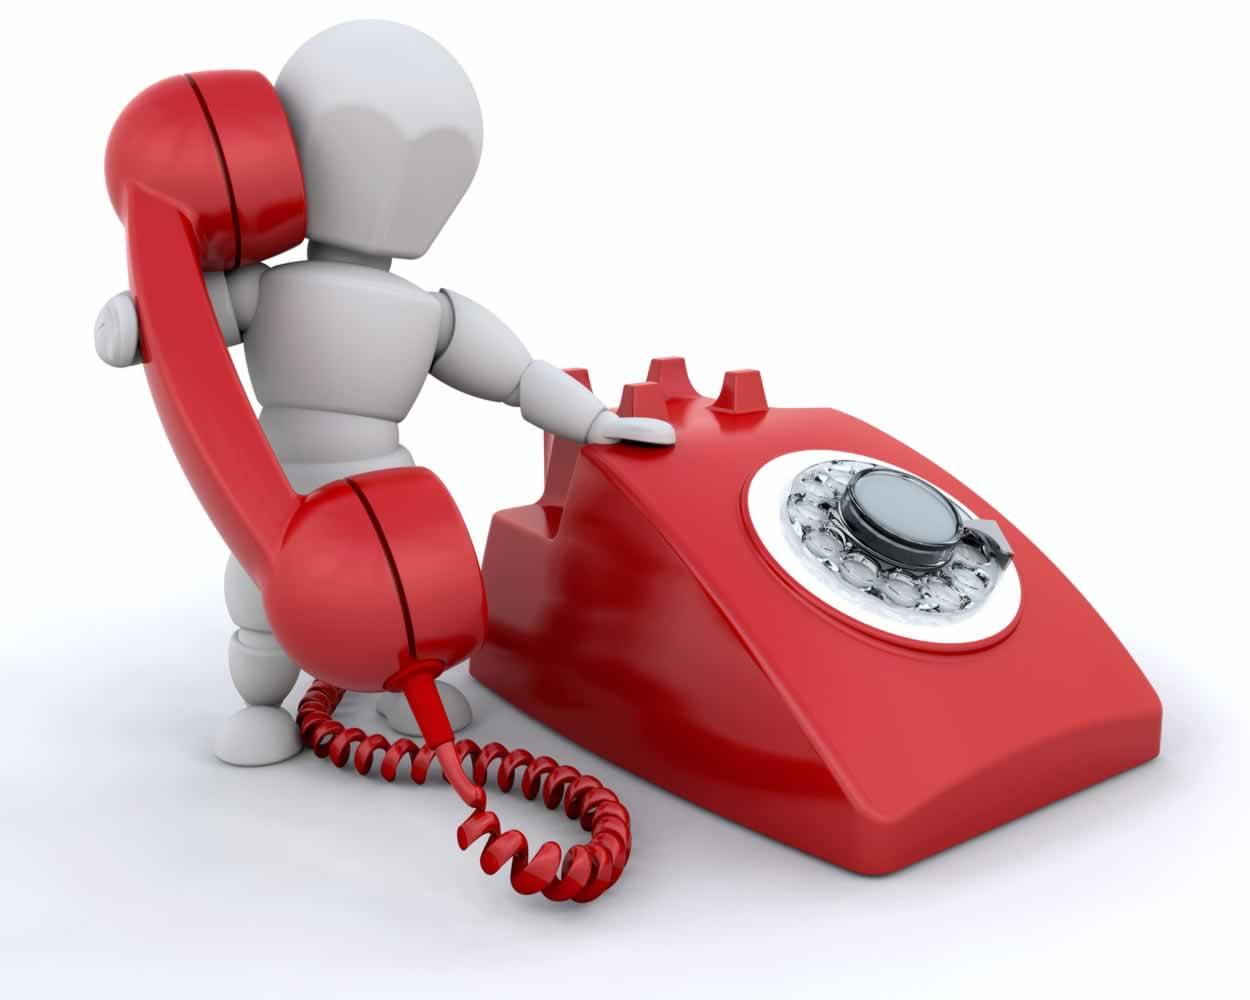 Emergency Call Clipart - Clipart Kid